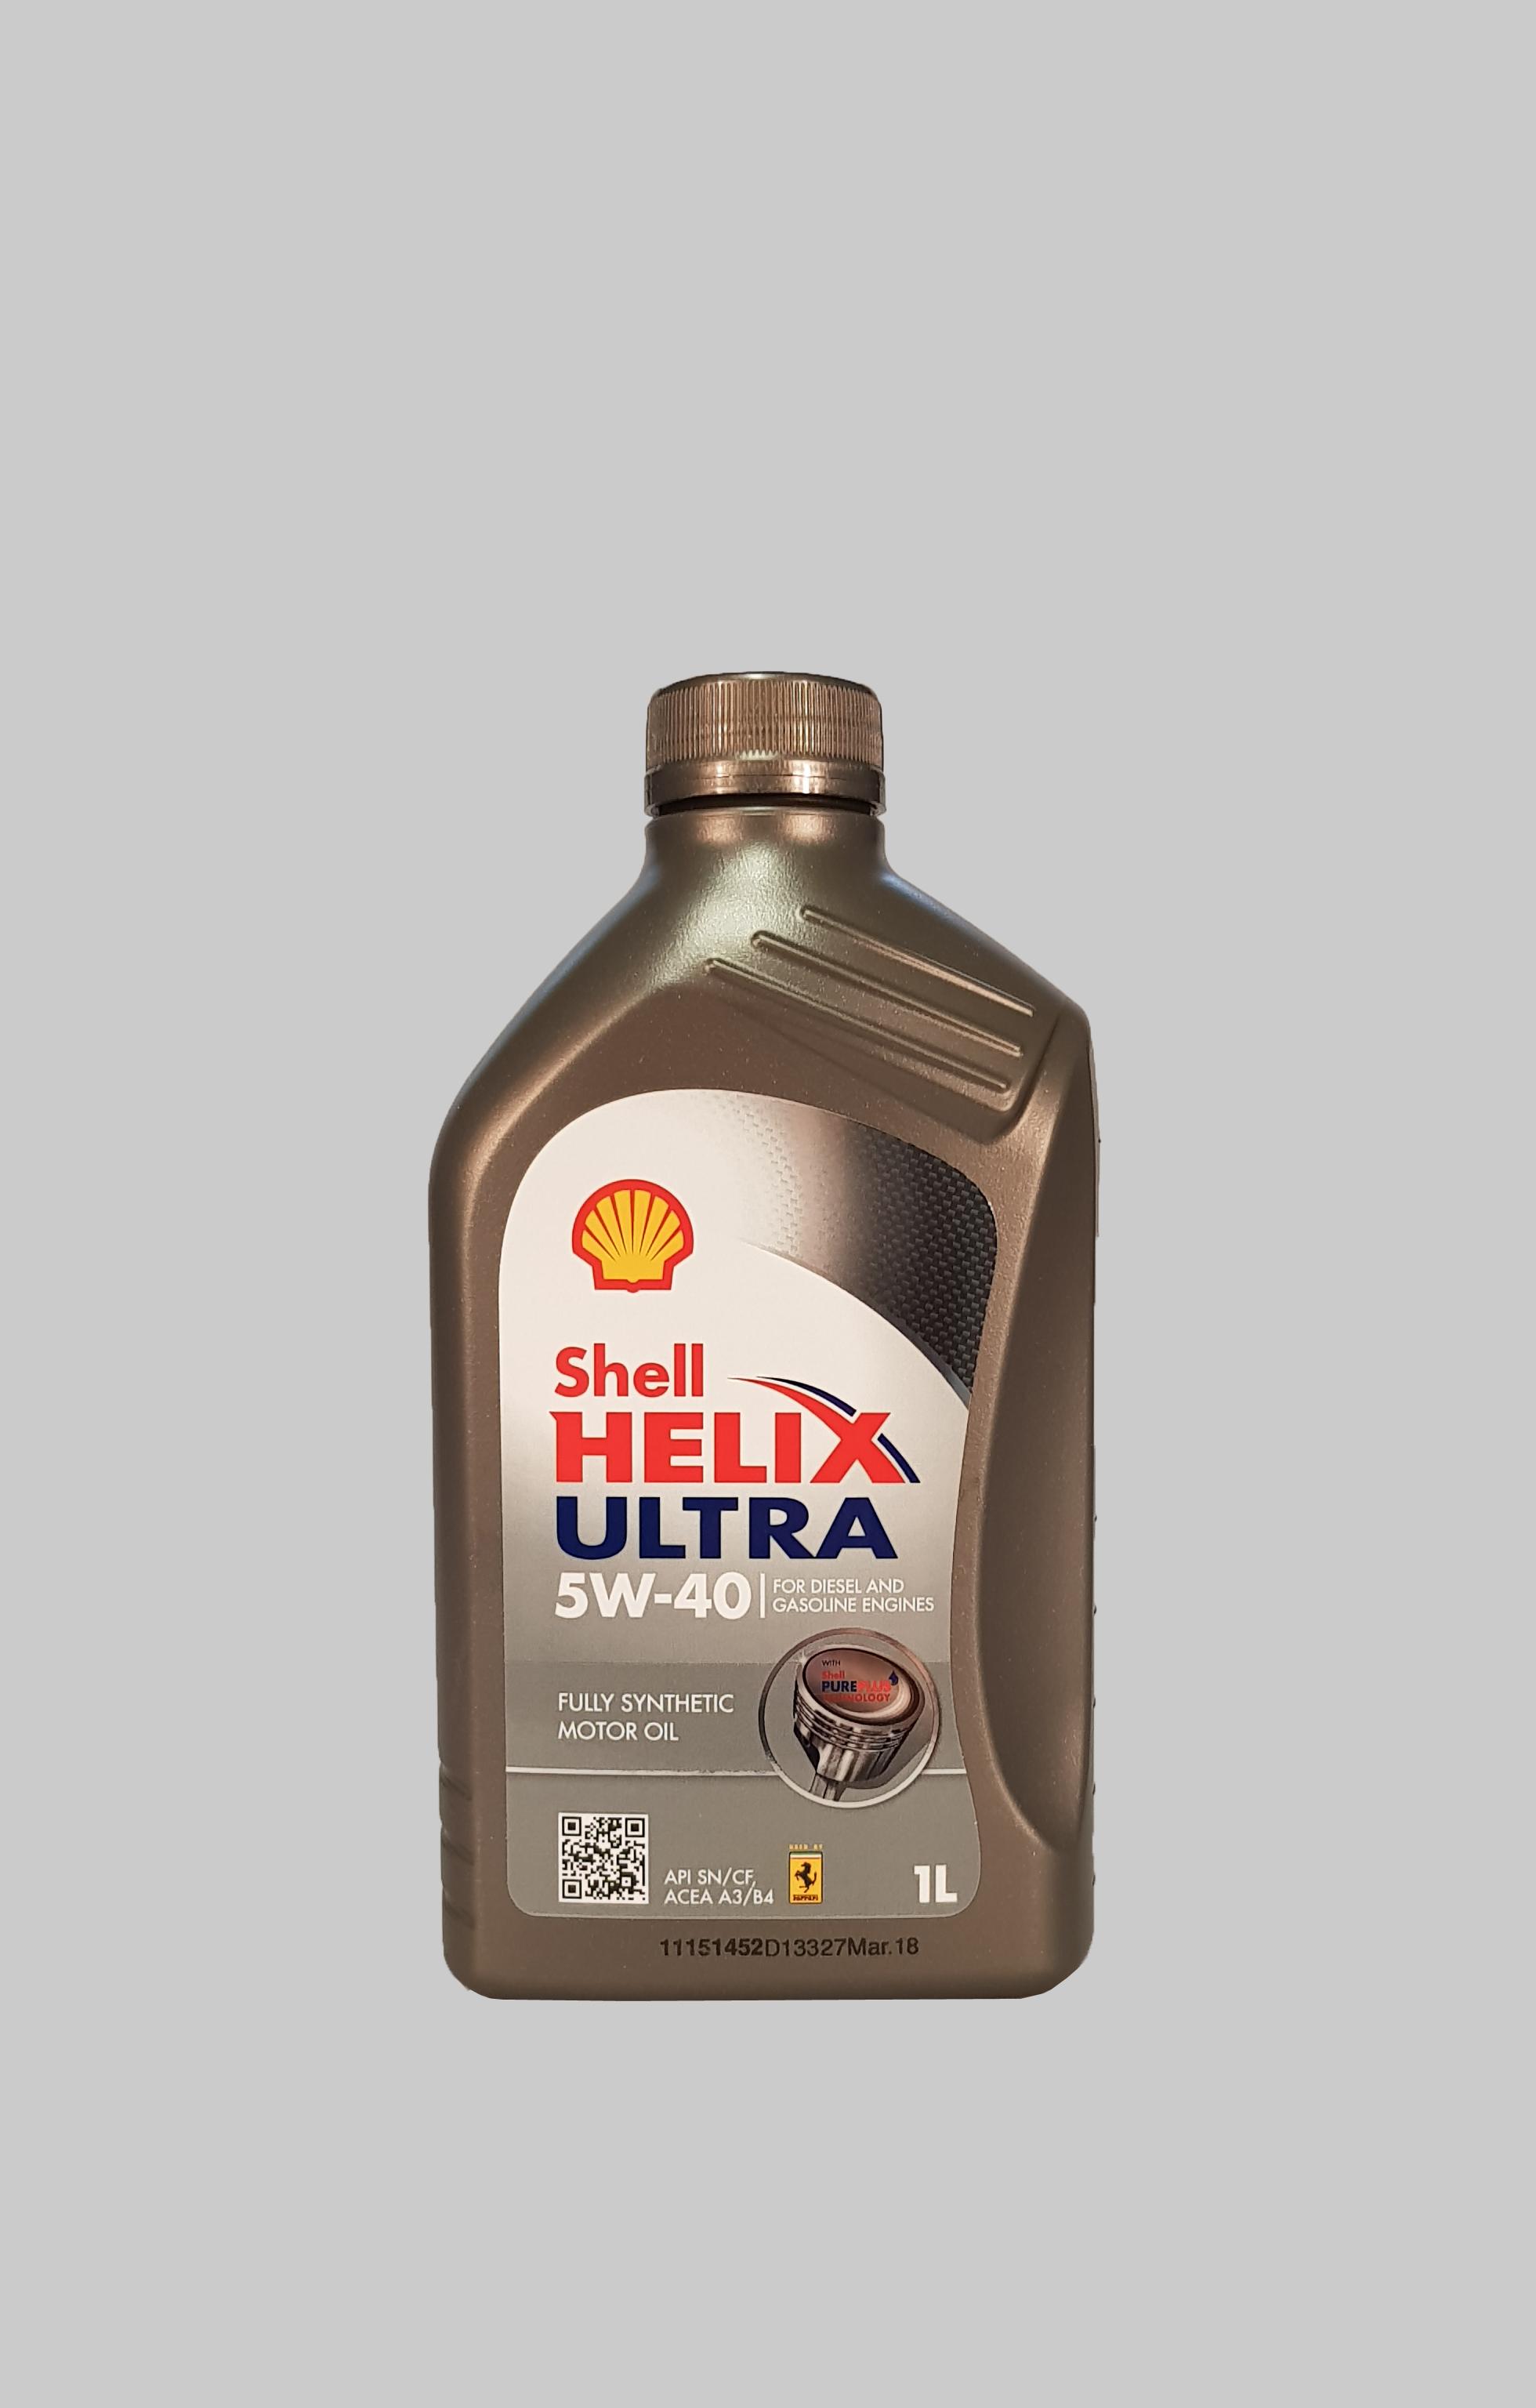 Shell Helix Ultra 5W-40 1 Liter